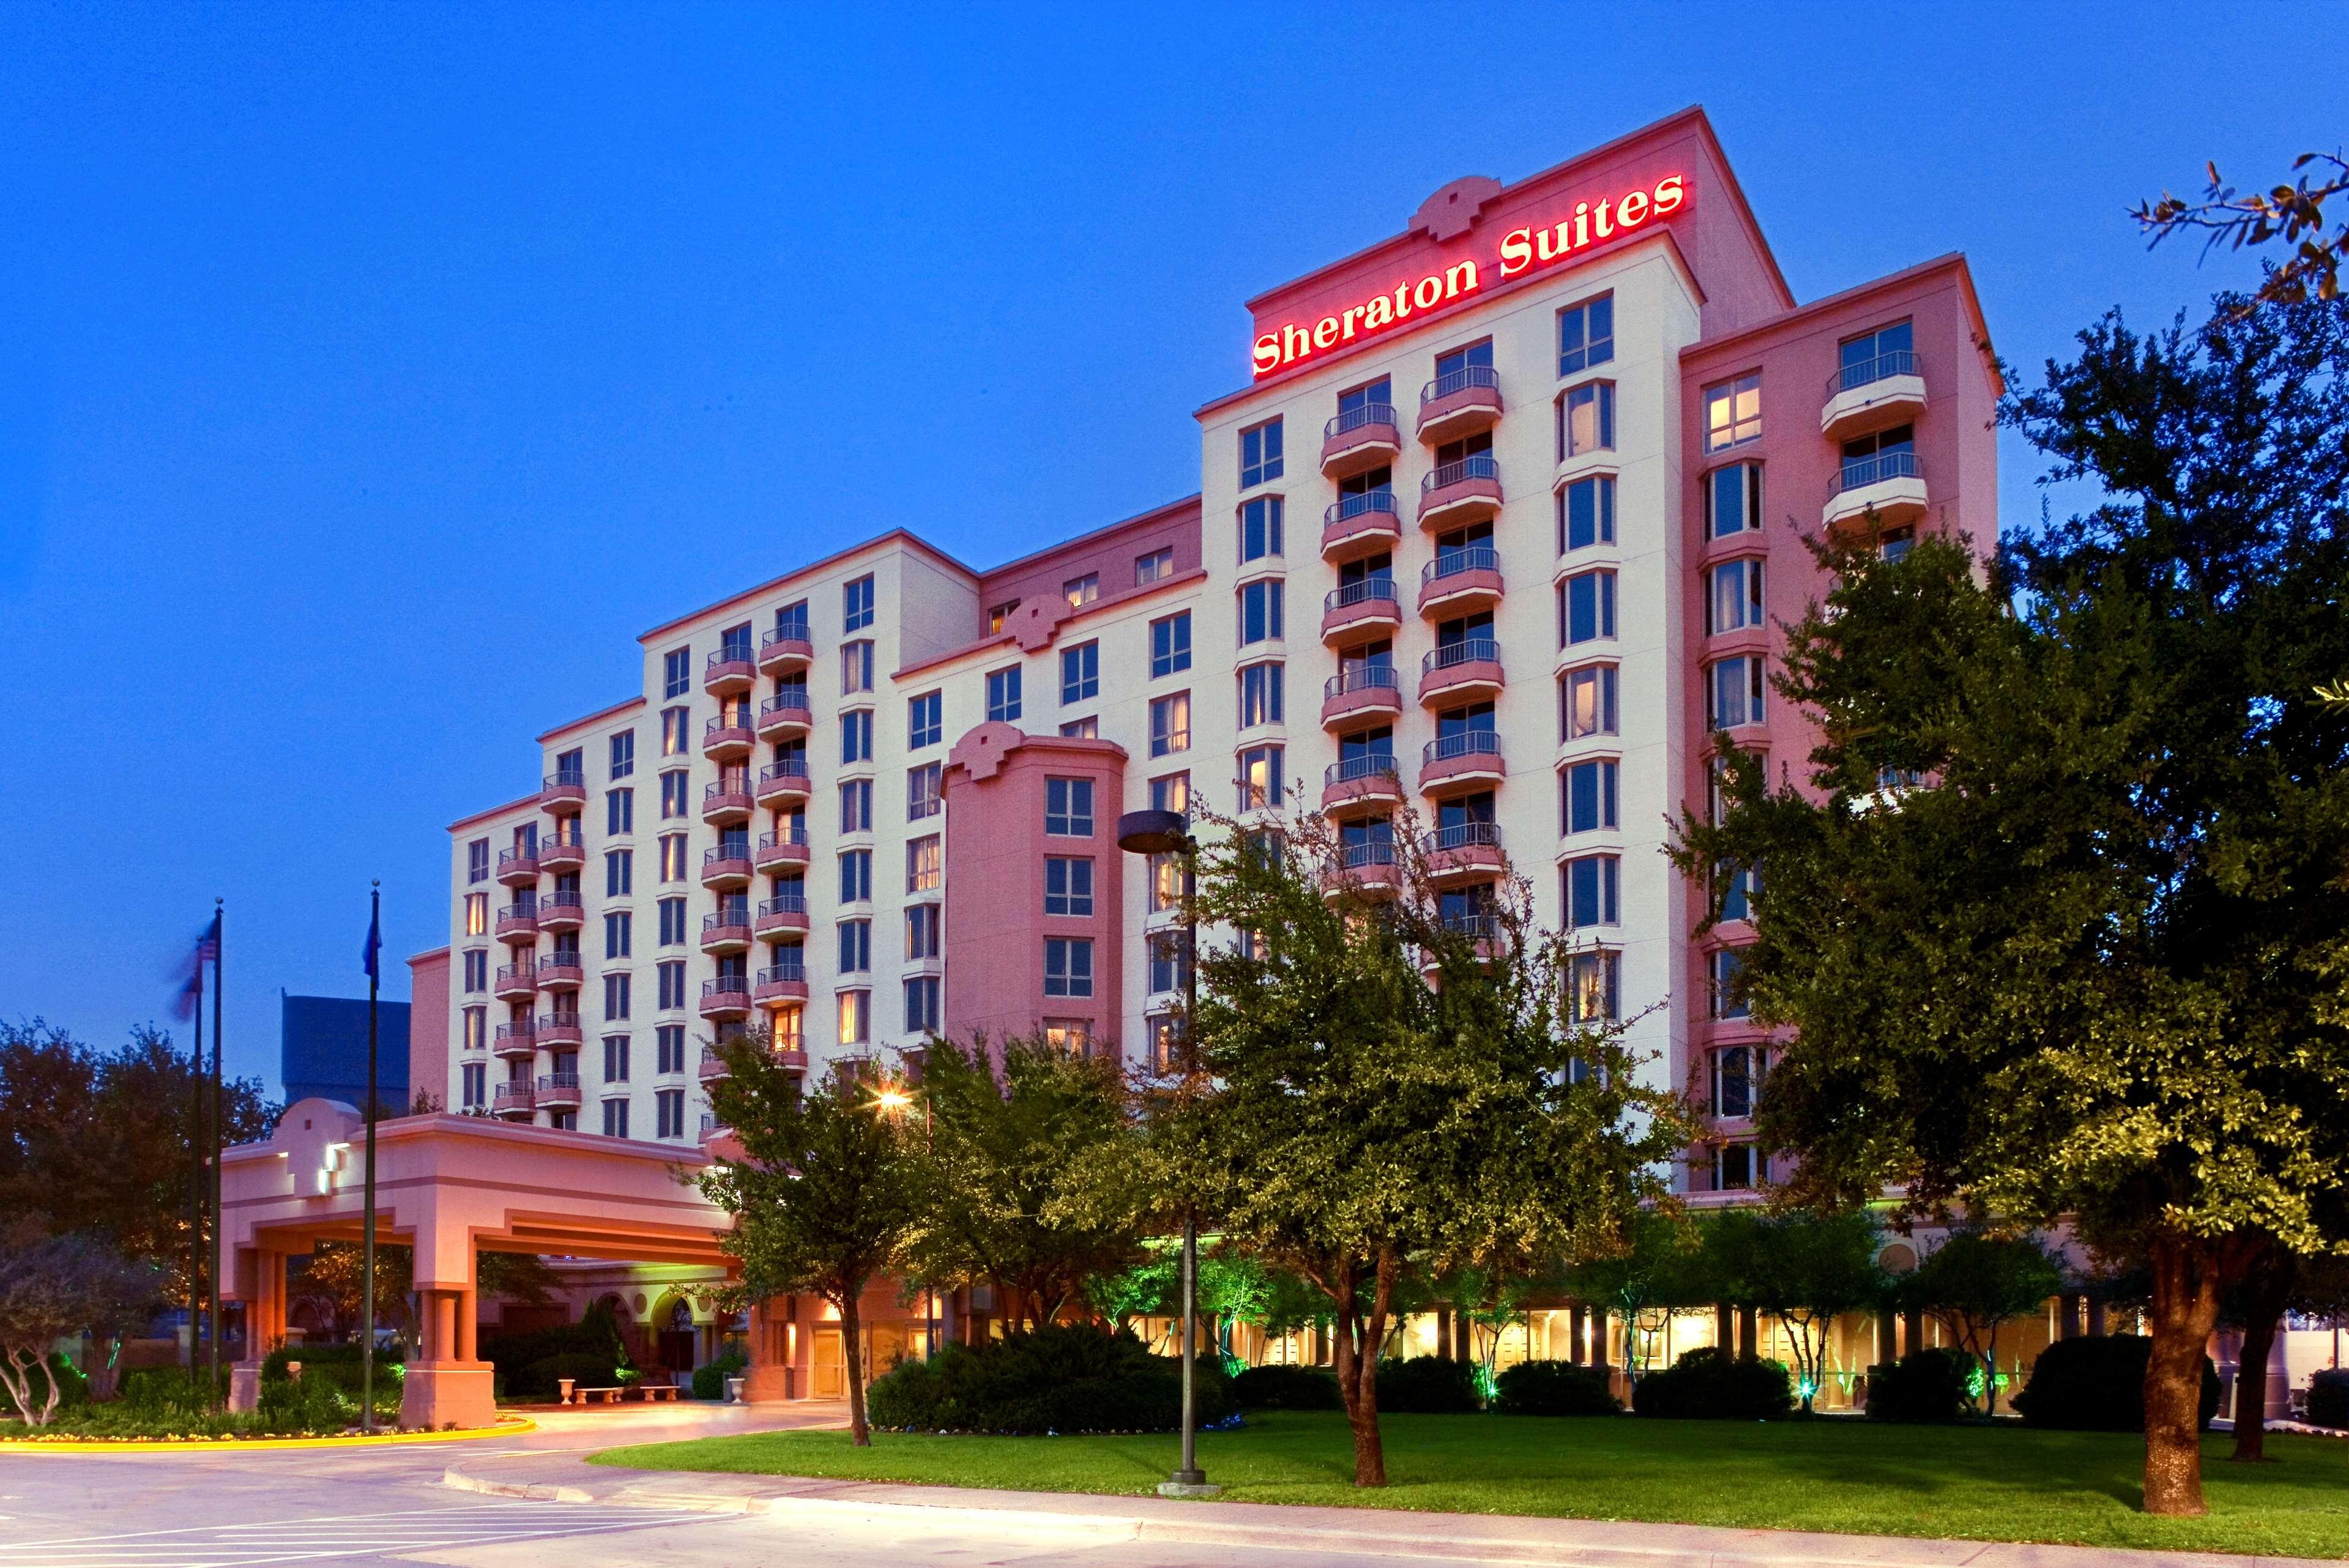 Sheraton Suites Market Center Dallas image 0